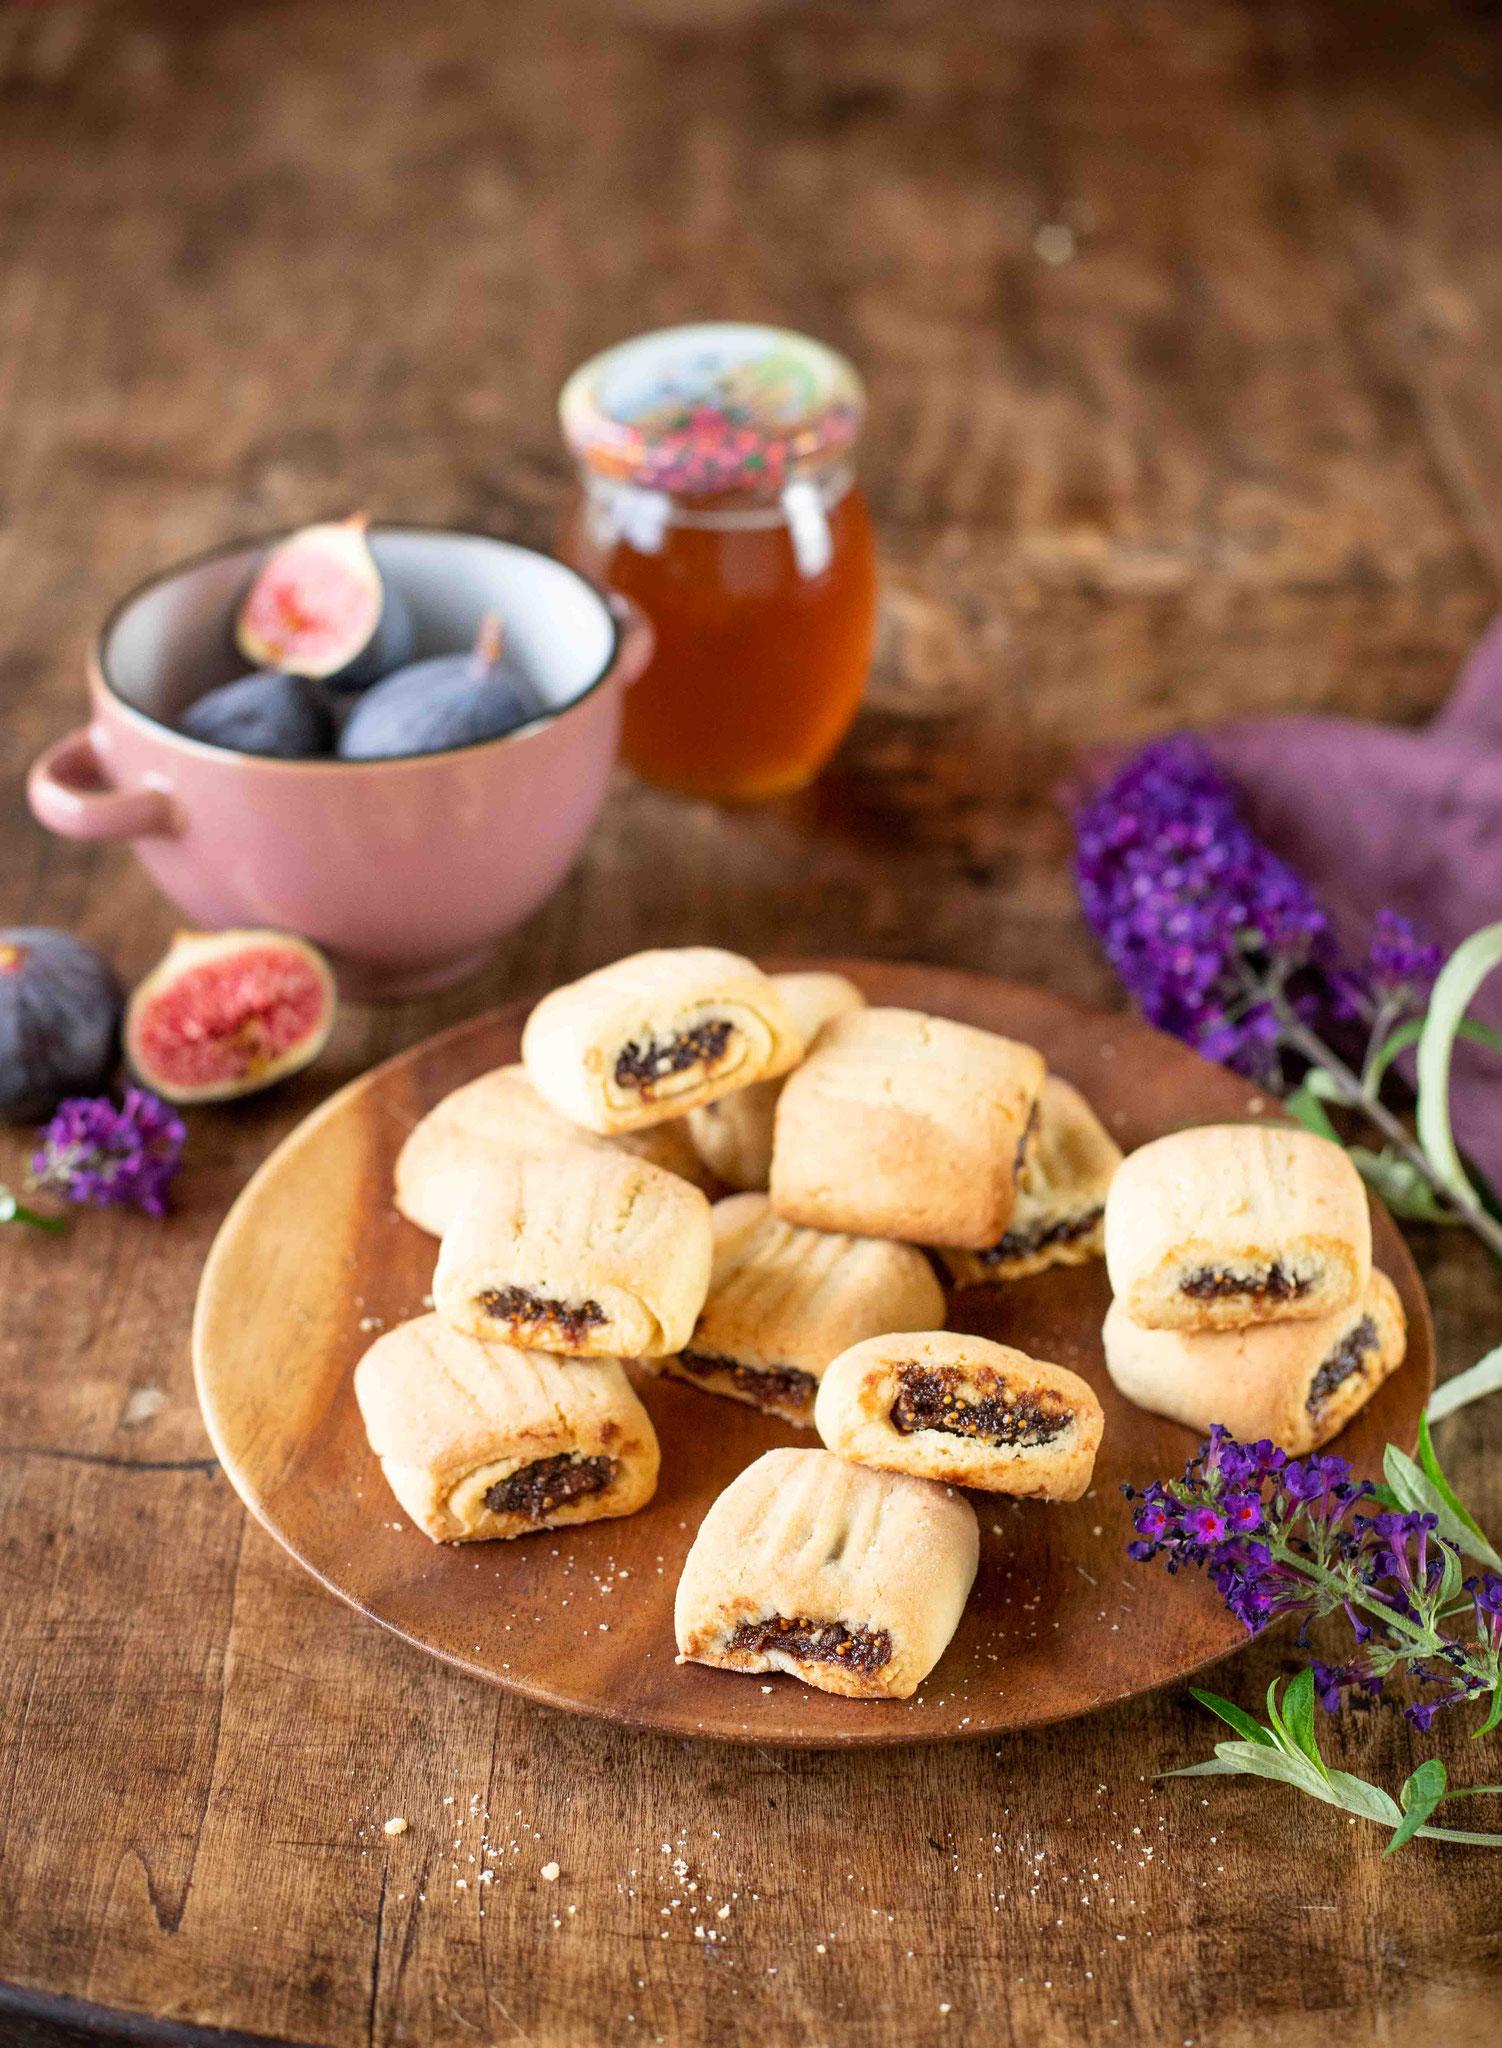 Figolus : biscuits aux figues